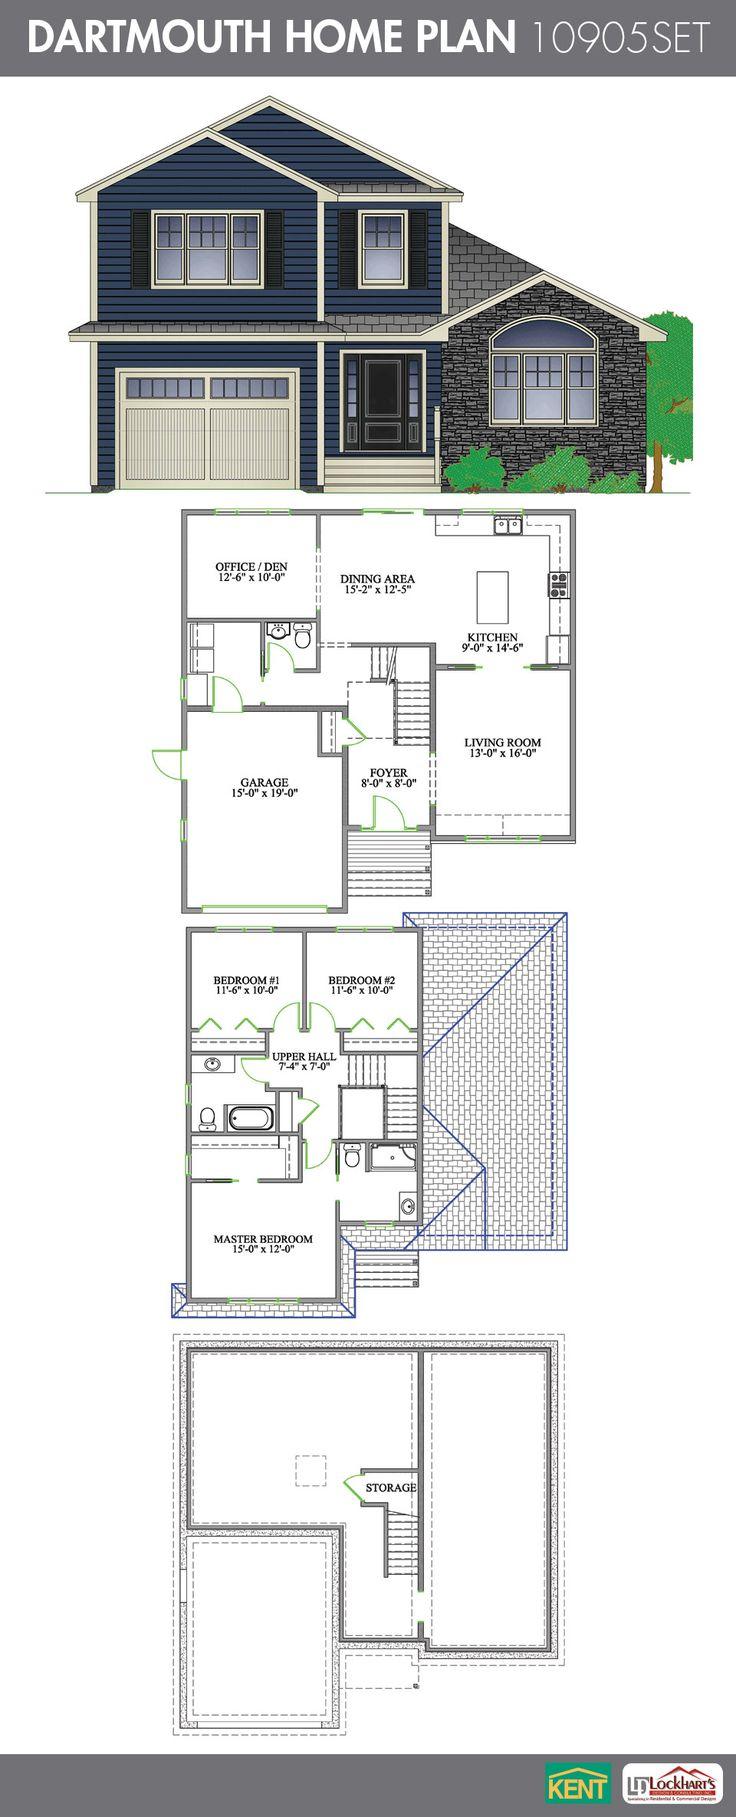 Master Bedroom And Bath Floor Plan Cool Home Decoration Interior House Designer